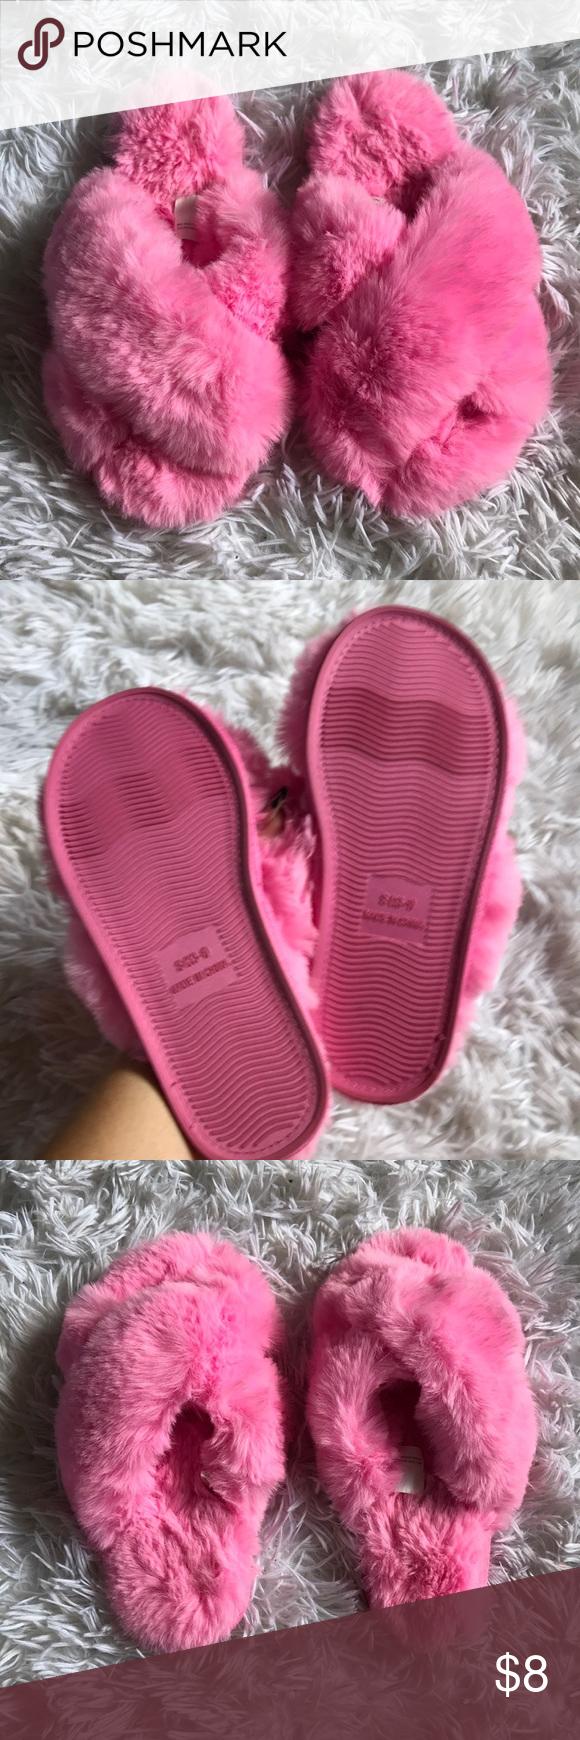 Children's pink fluffy slippers | Pink